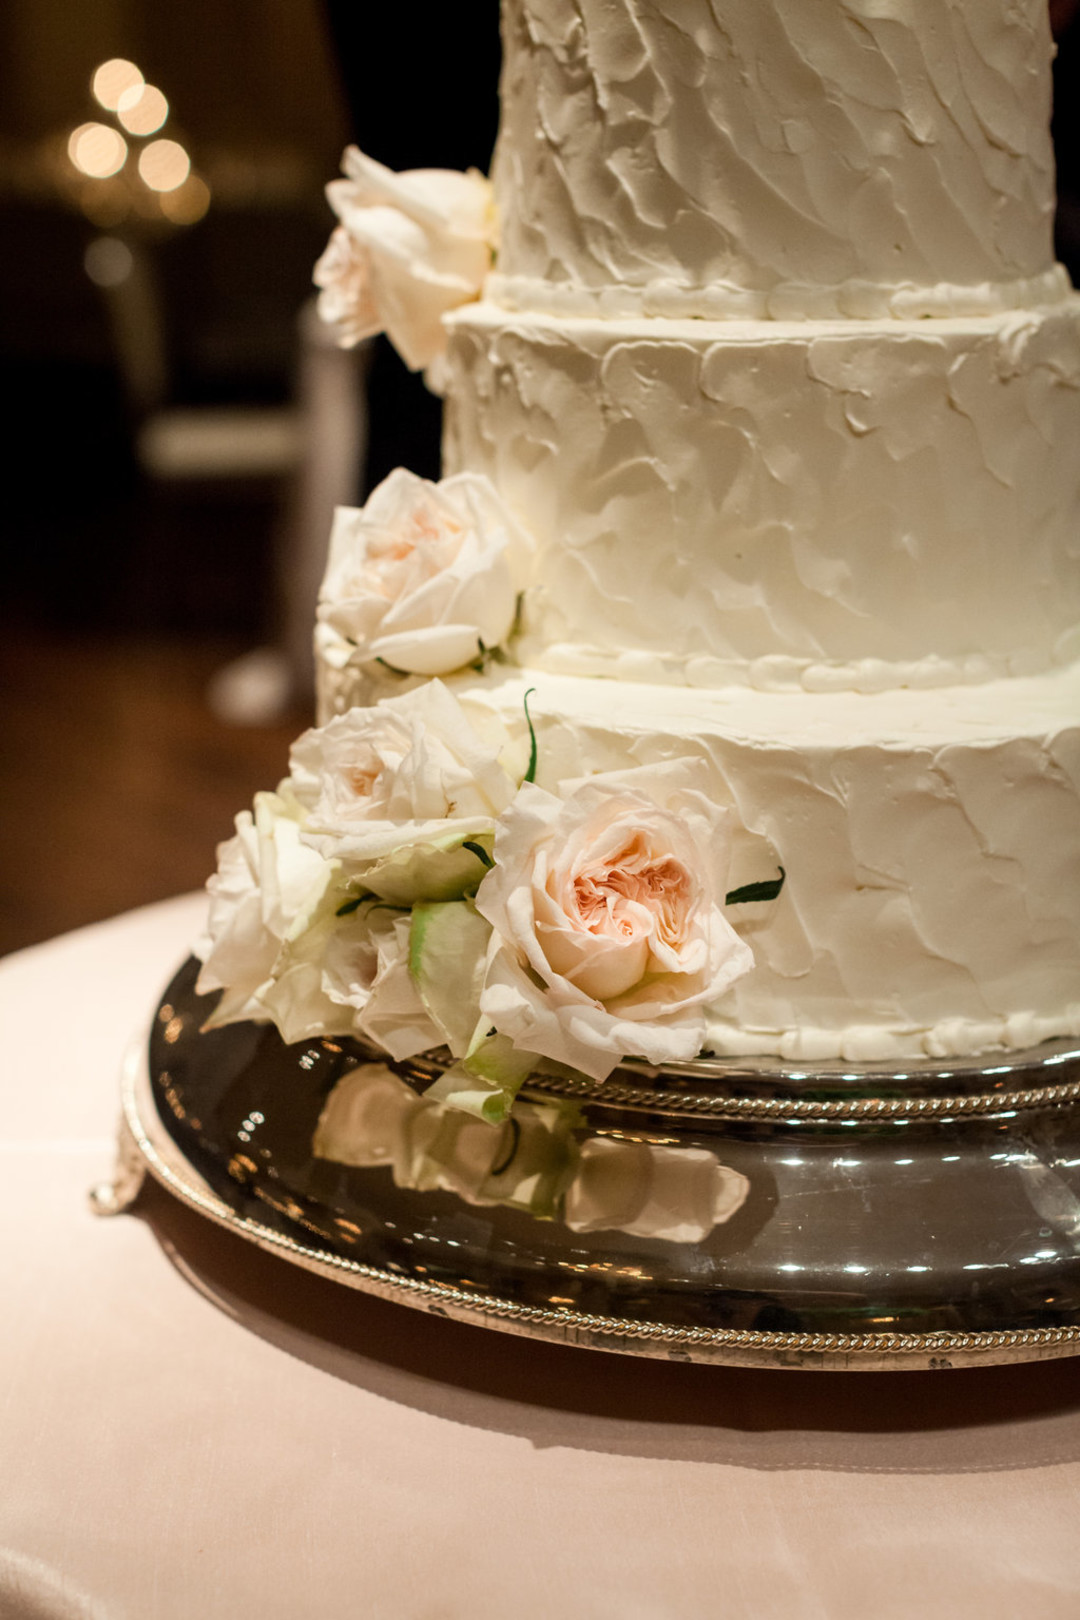 Rose Wedding Cake The Standard Room Chicago Wedding Julia Franzosa Photography